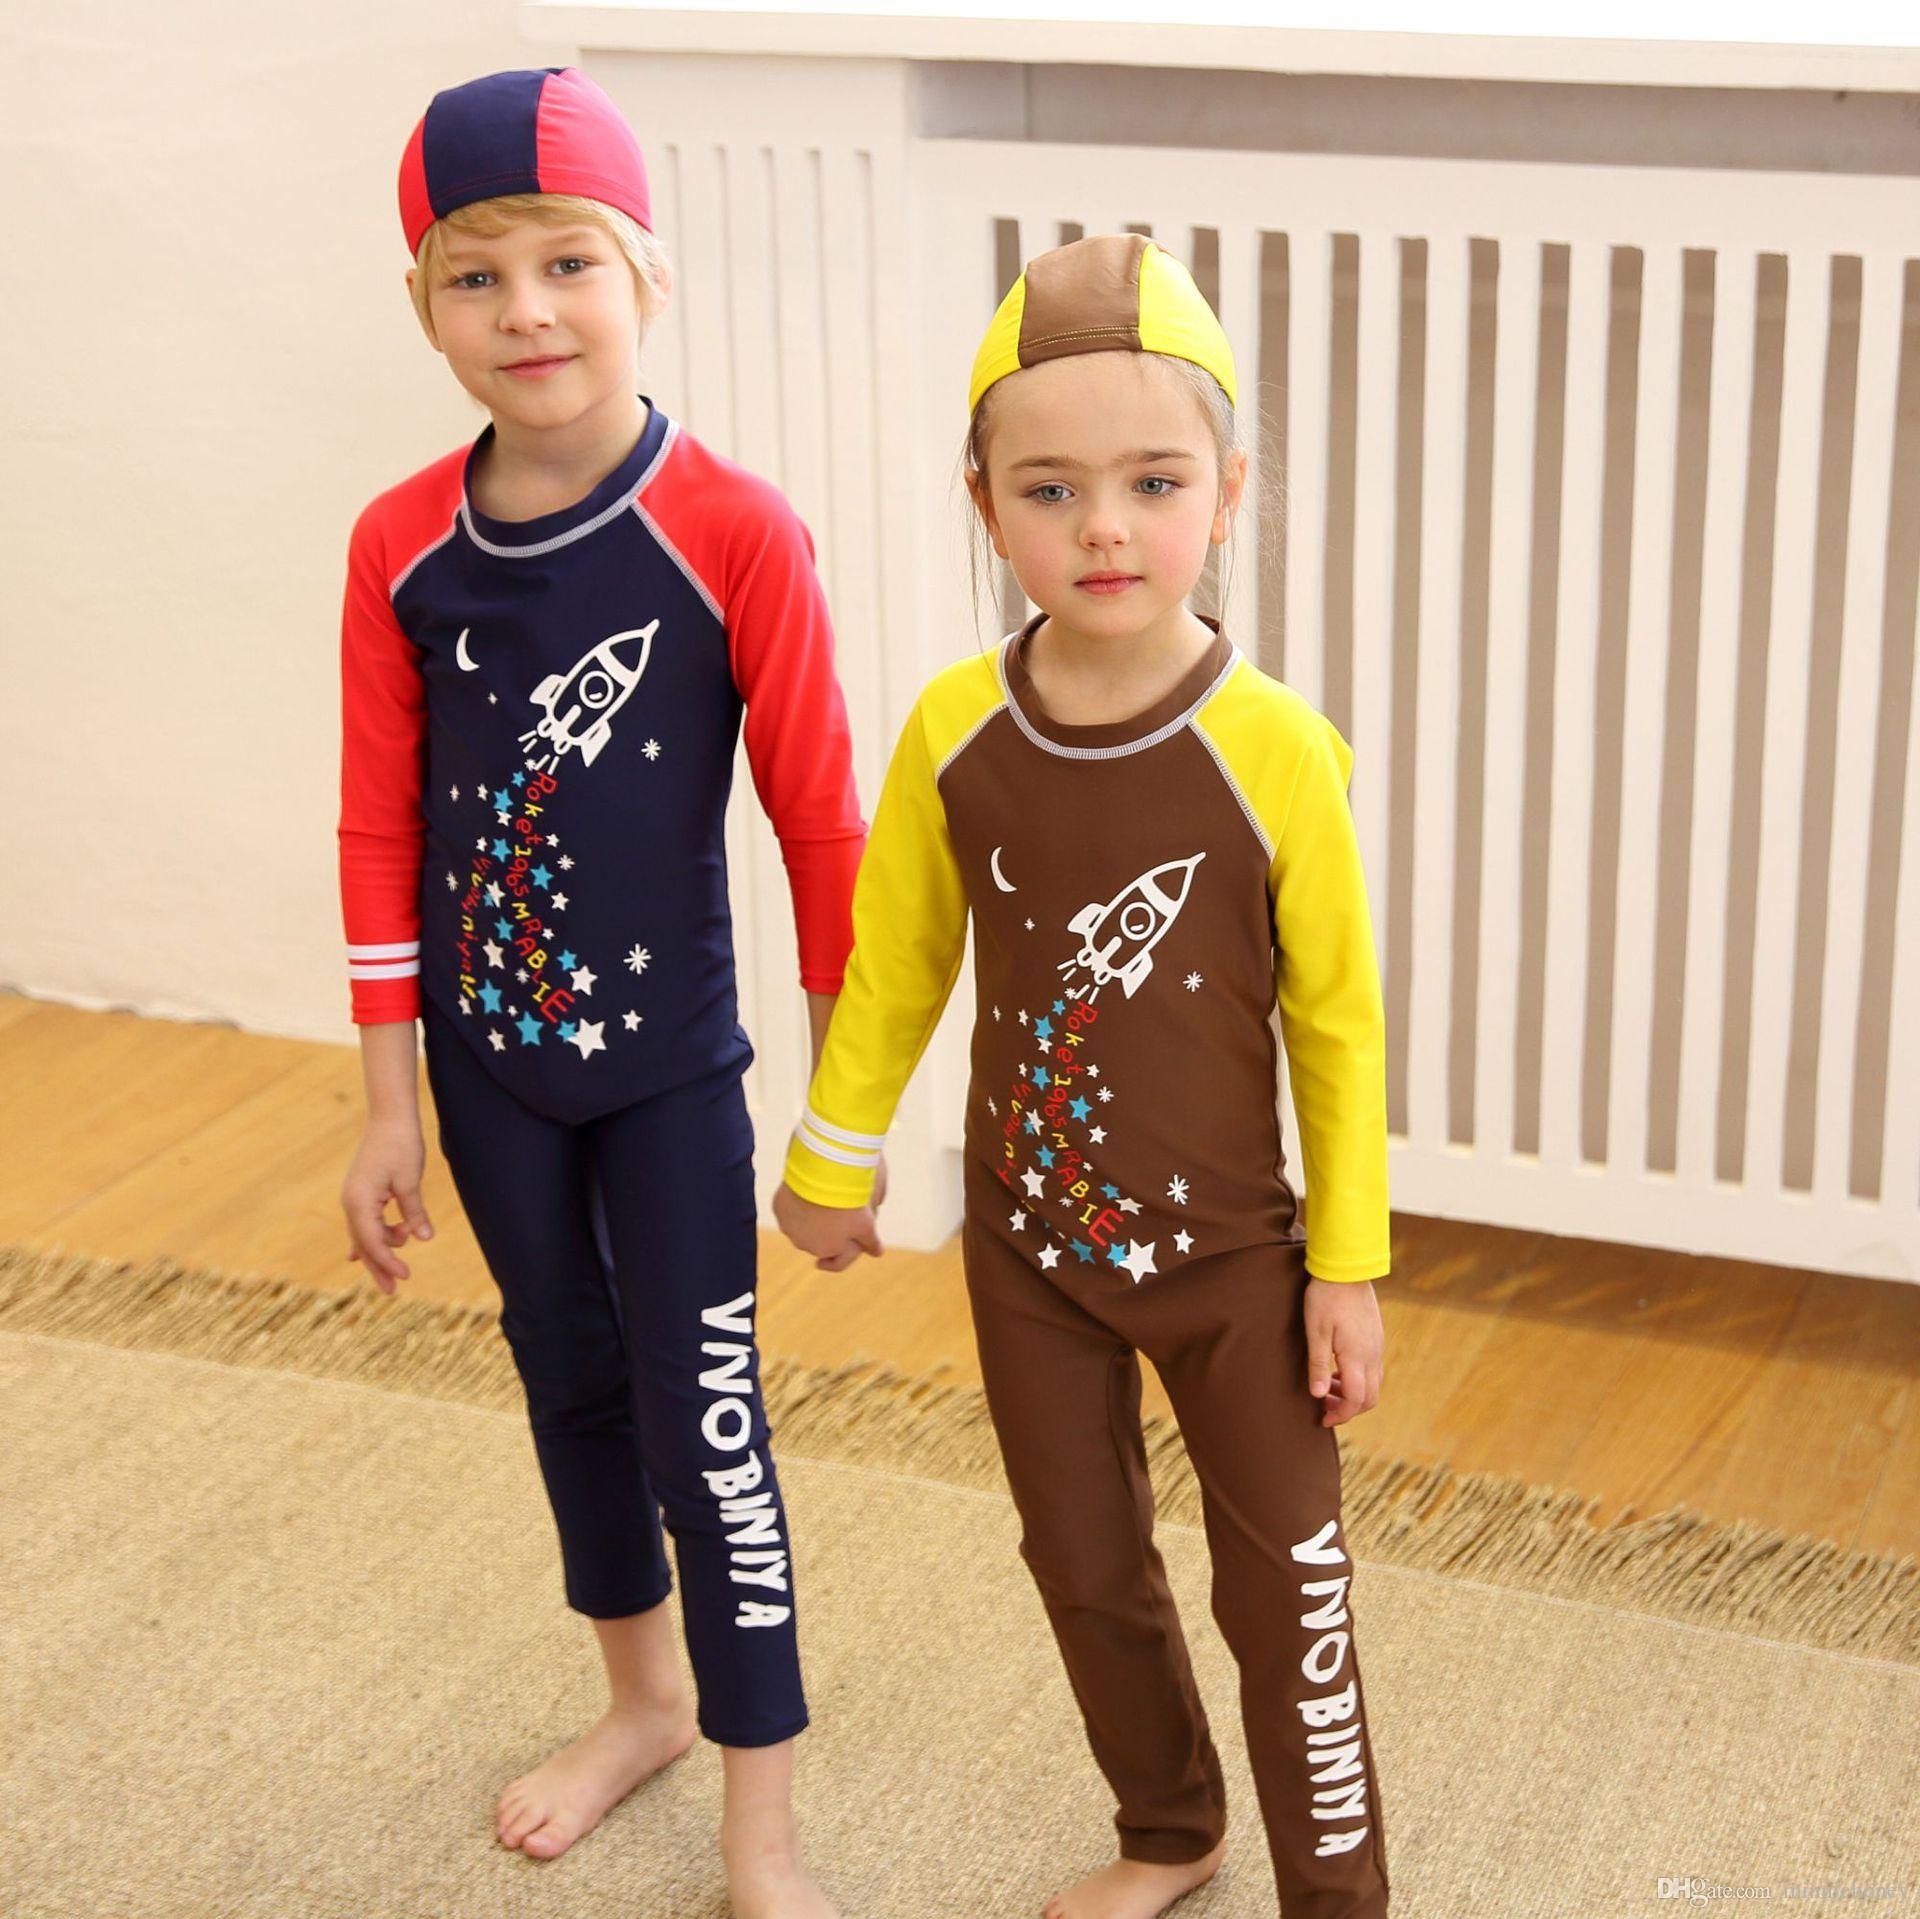 0f7421d0b02e8 2019 2 8 Years Children Boys Girls Swimsuit One Piece Long Sleeve Swimwear  UV Proof Quick Dryin Swimwear Bathing Suit From Minniehoney, $29.59 |  DHgate.Com